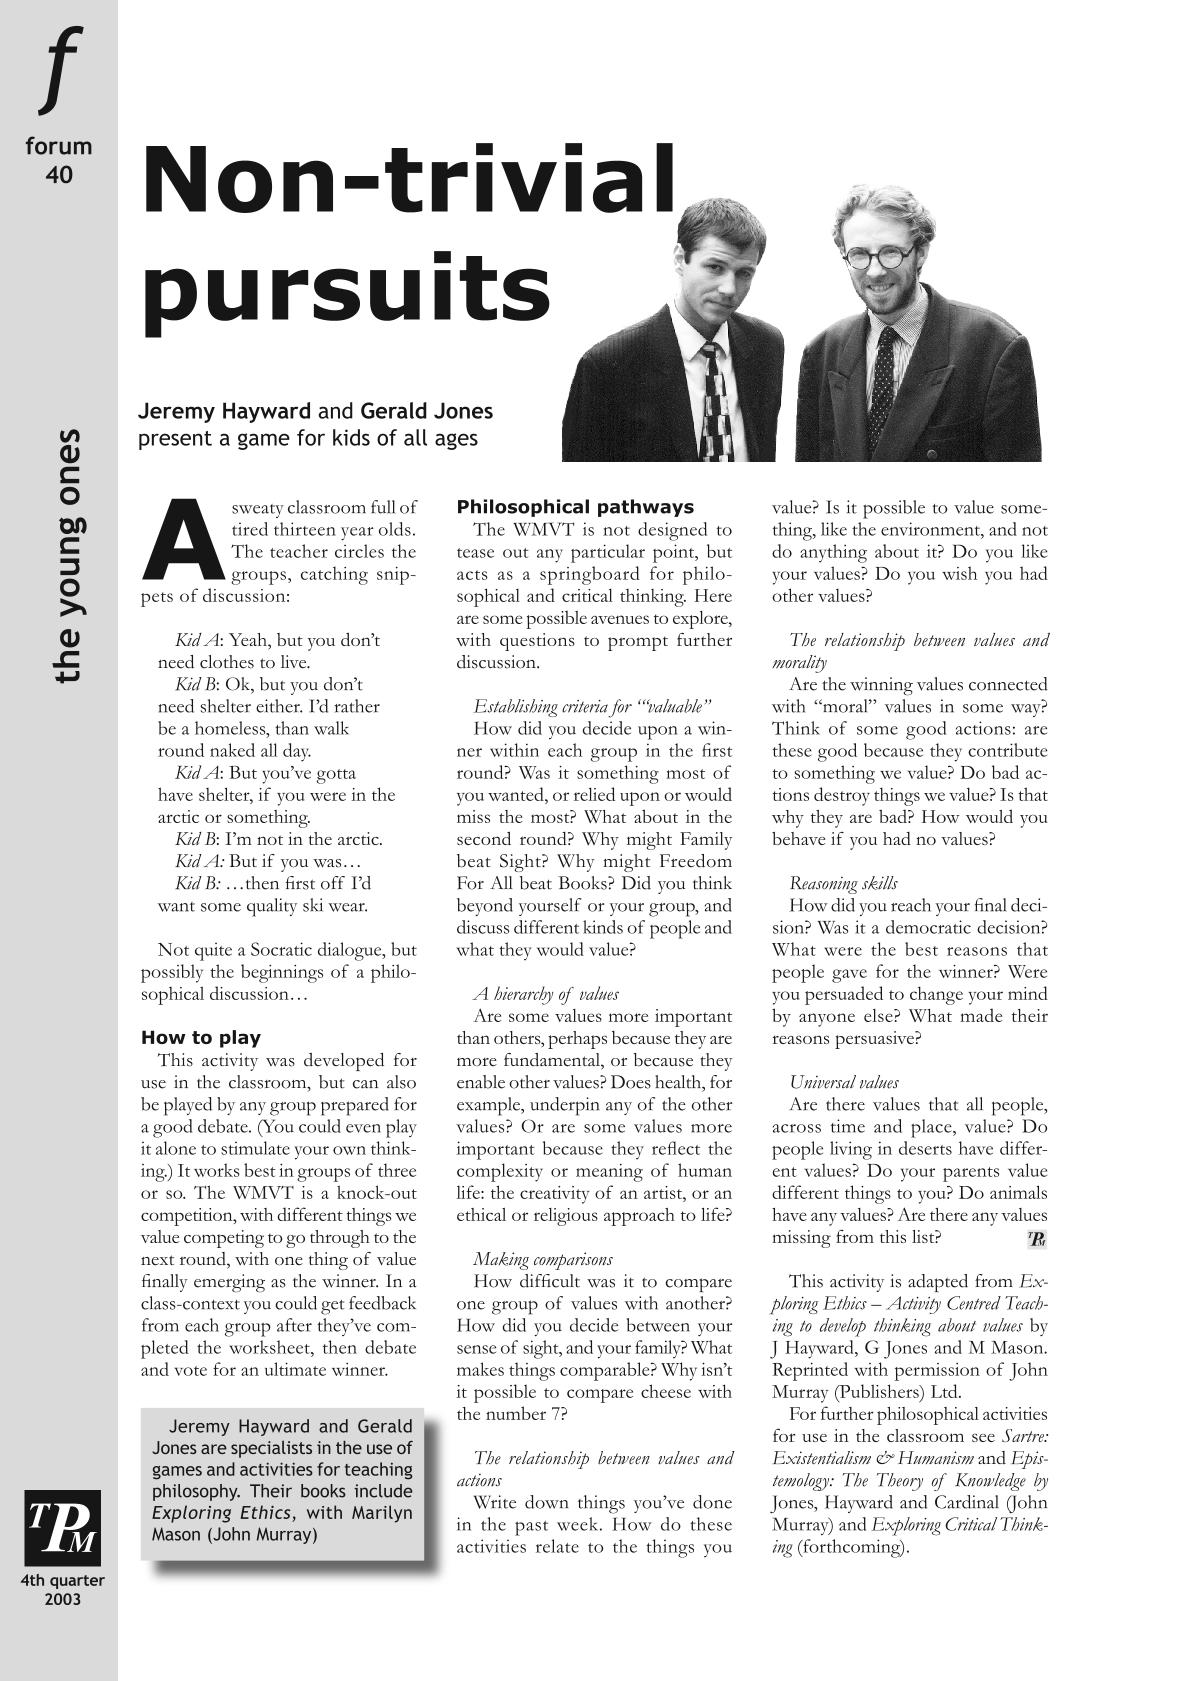 Non-trivial pursuits - Jeremy Hayward, Gerald Jones - The